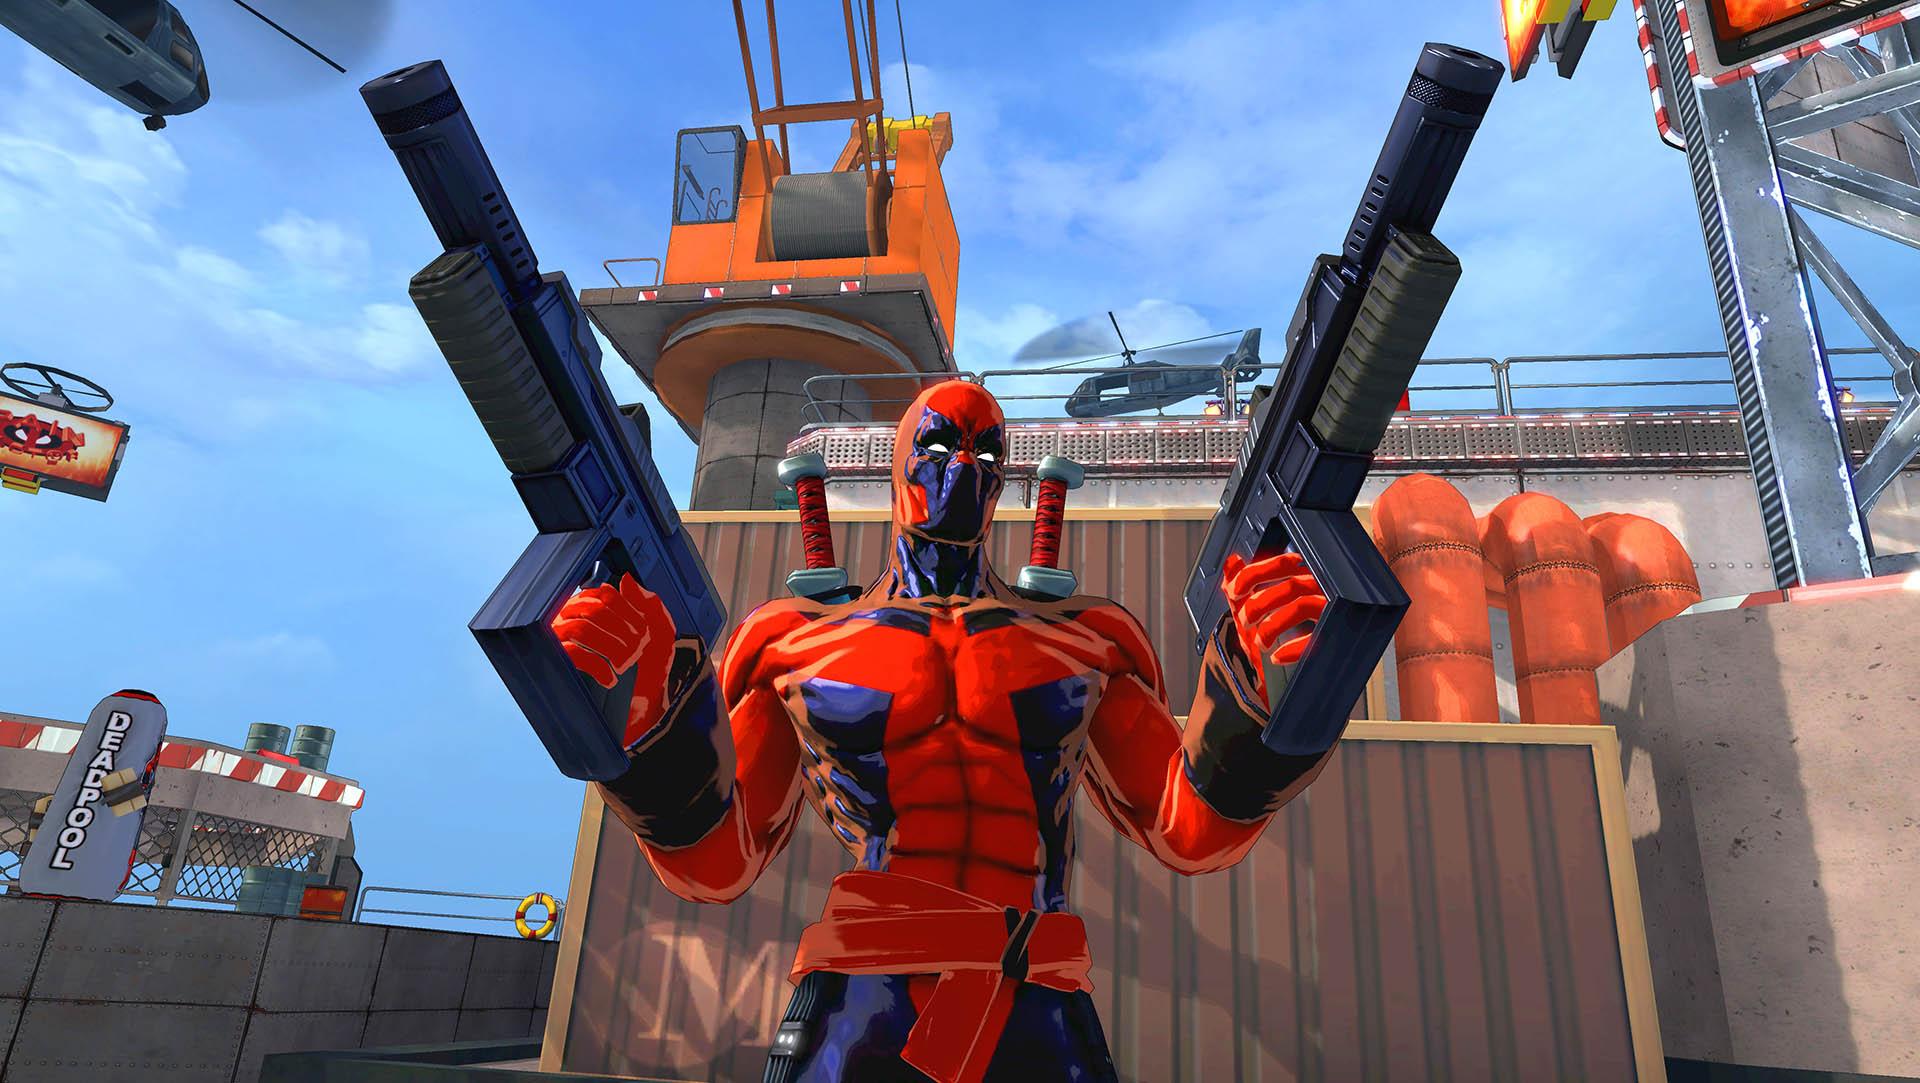 spider-man shattered deadpool